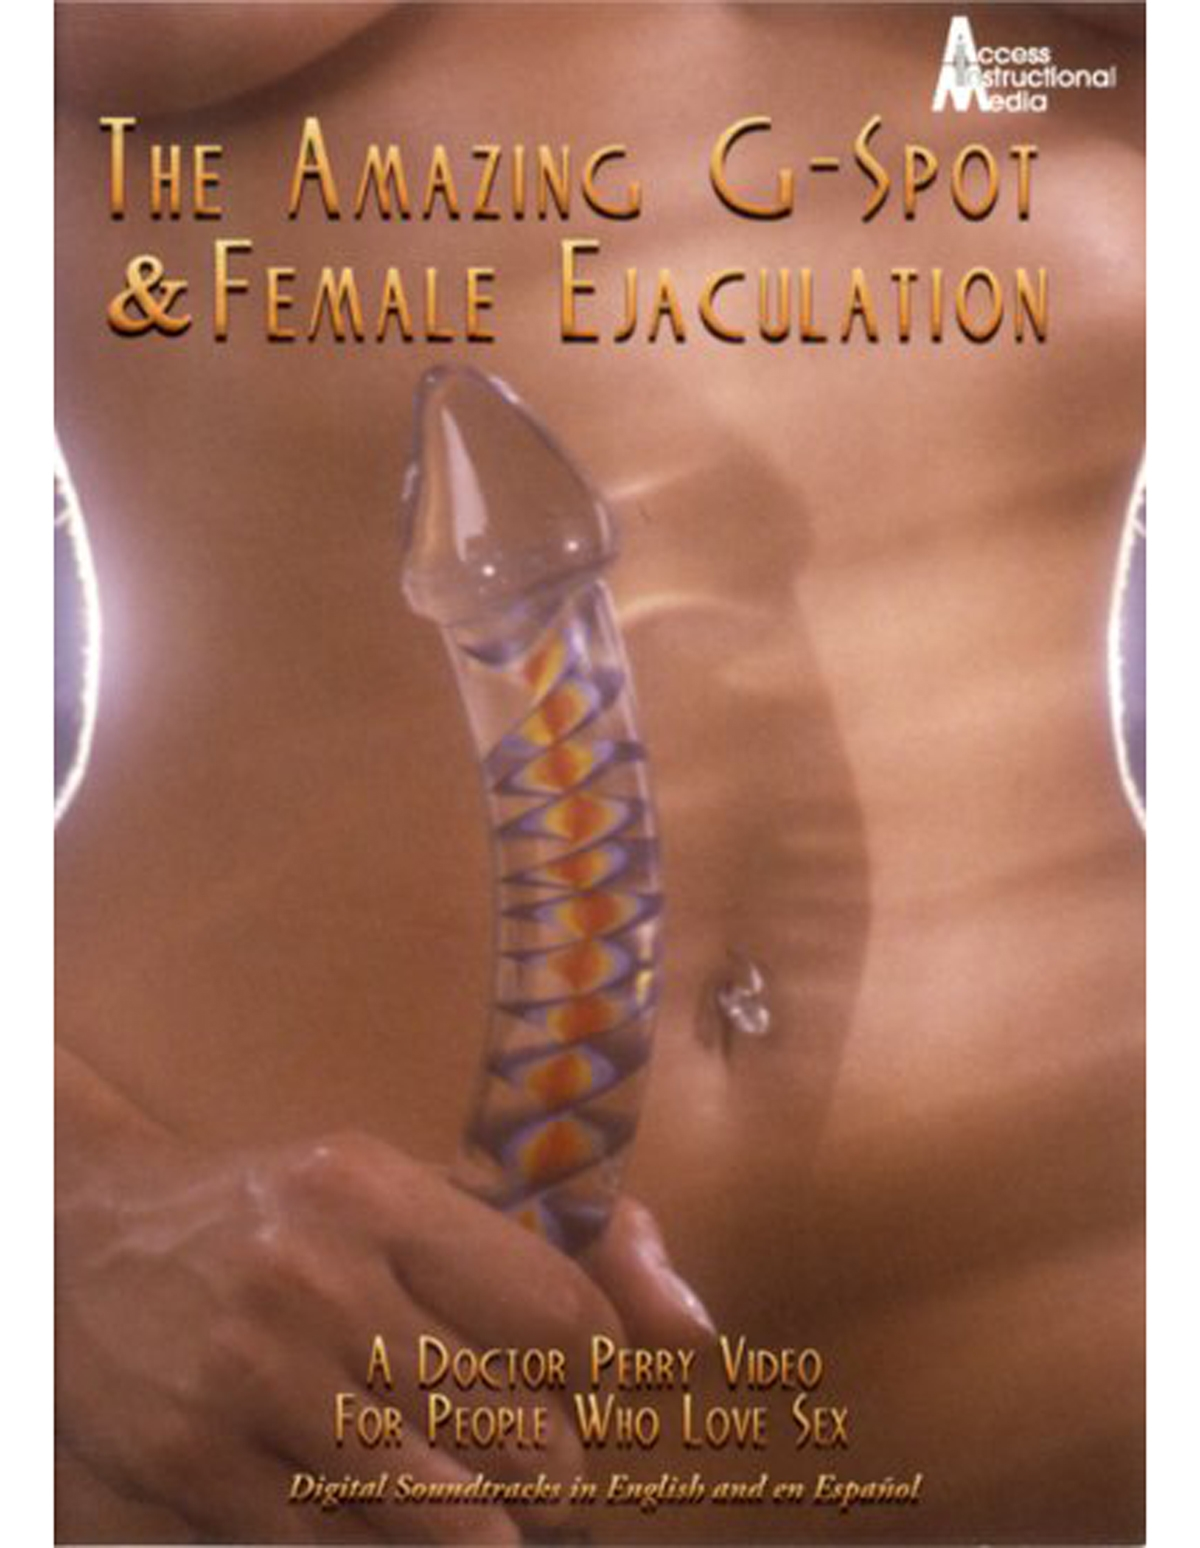 Amazing G Spot & Female Ejaculation Dvd